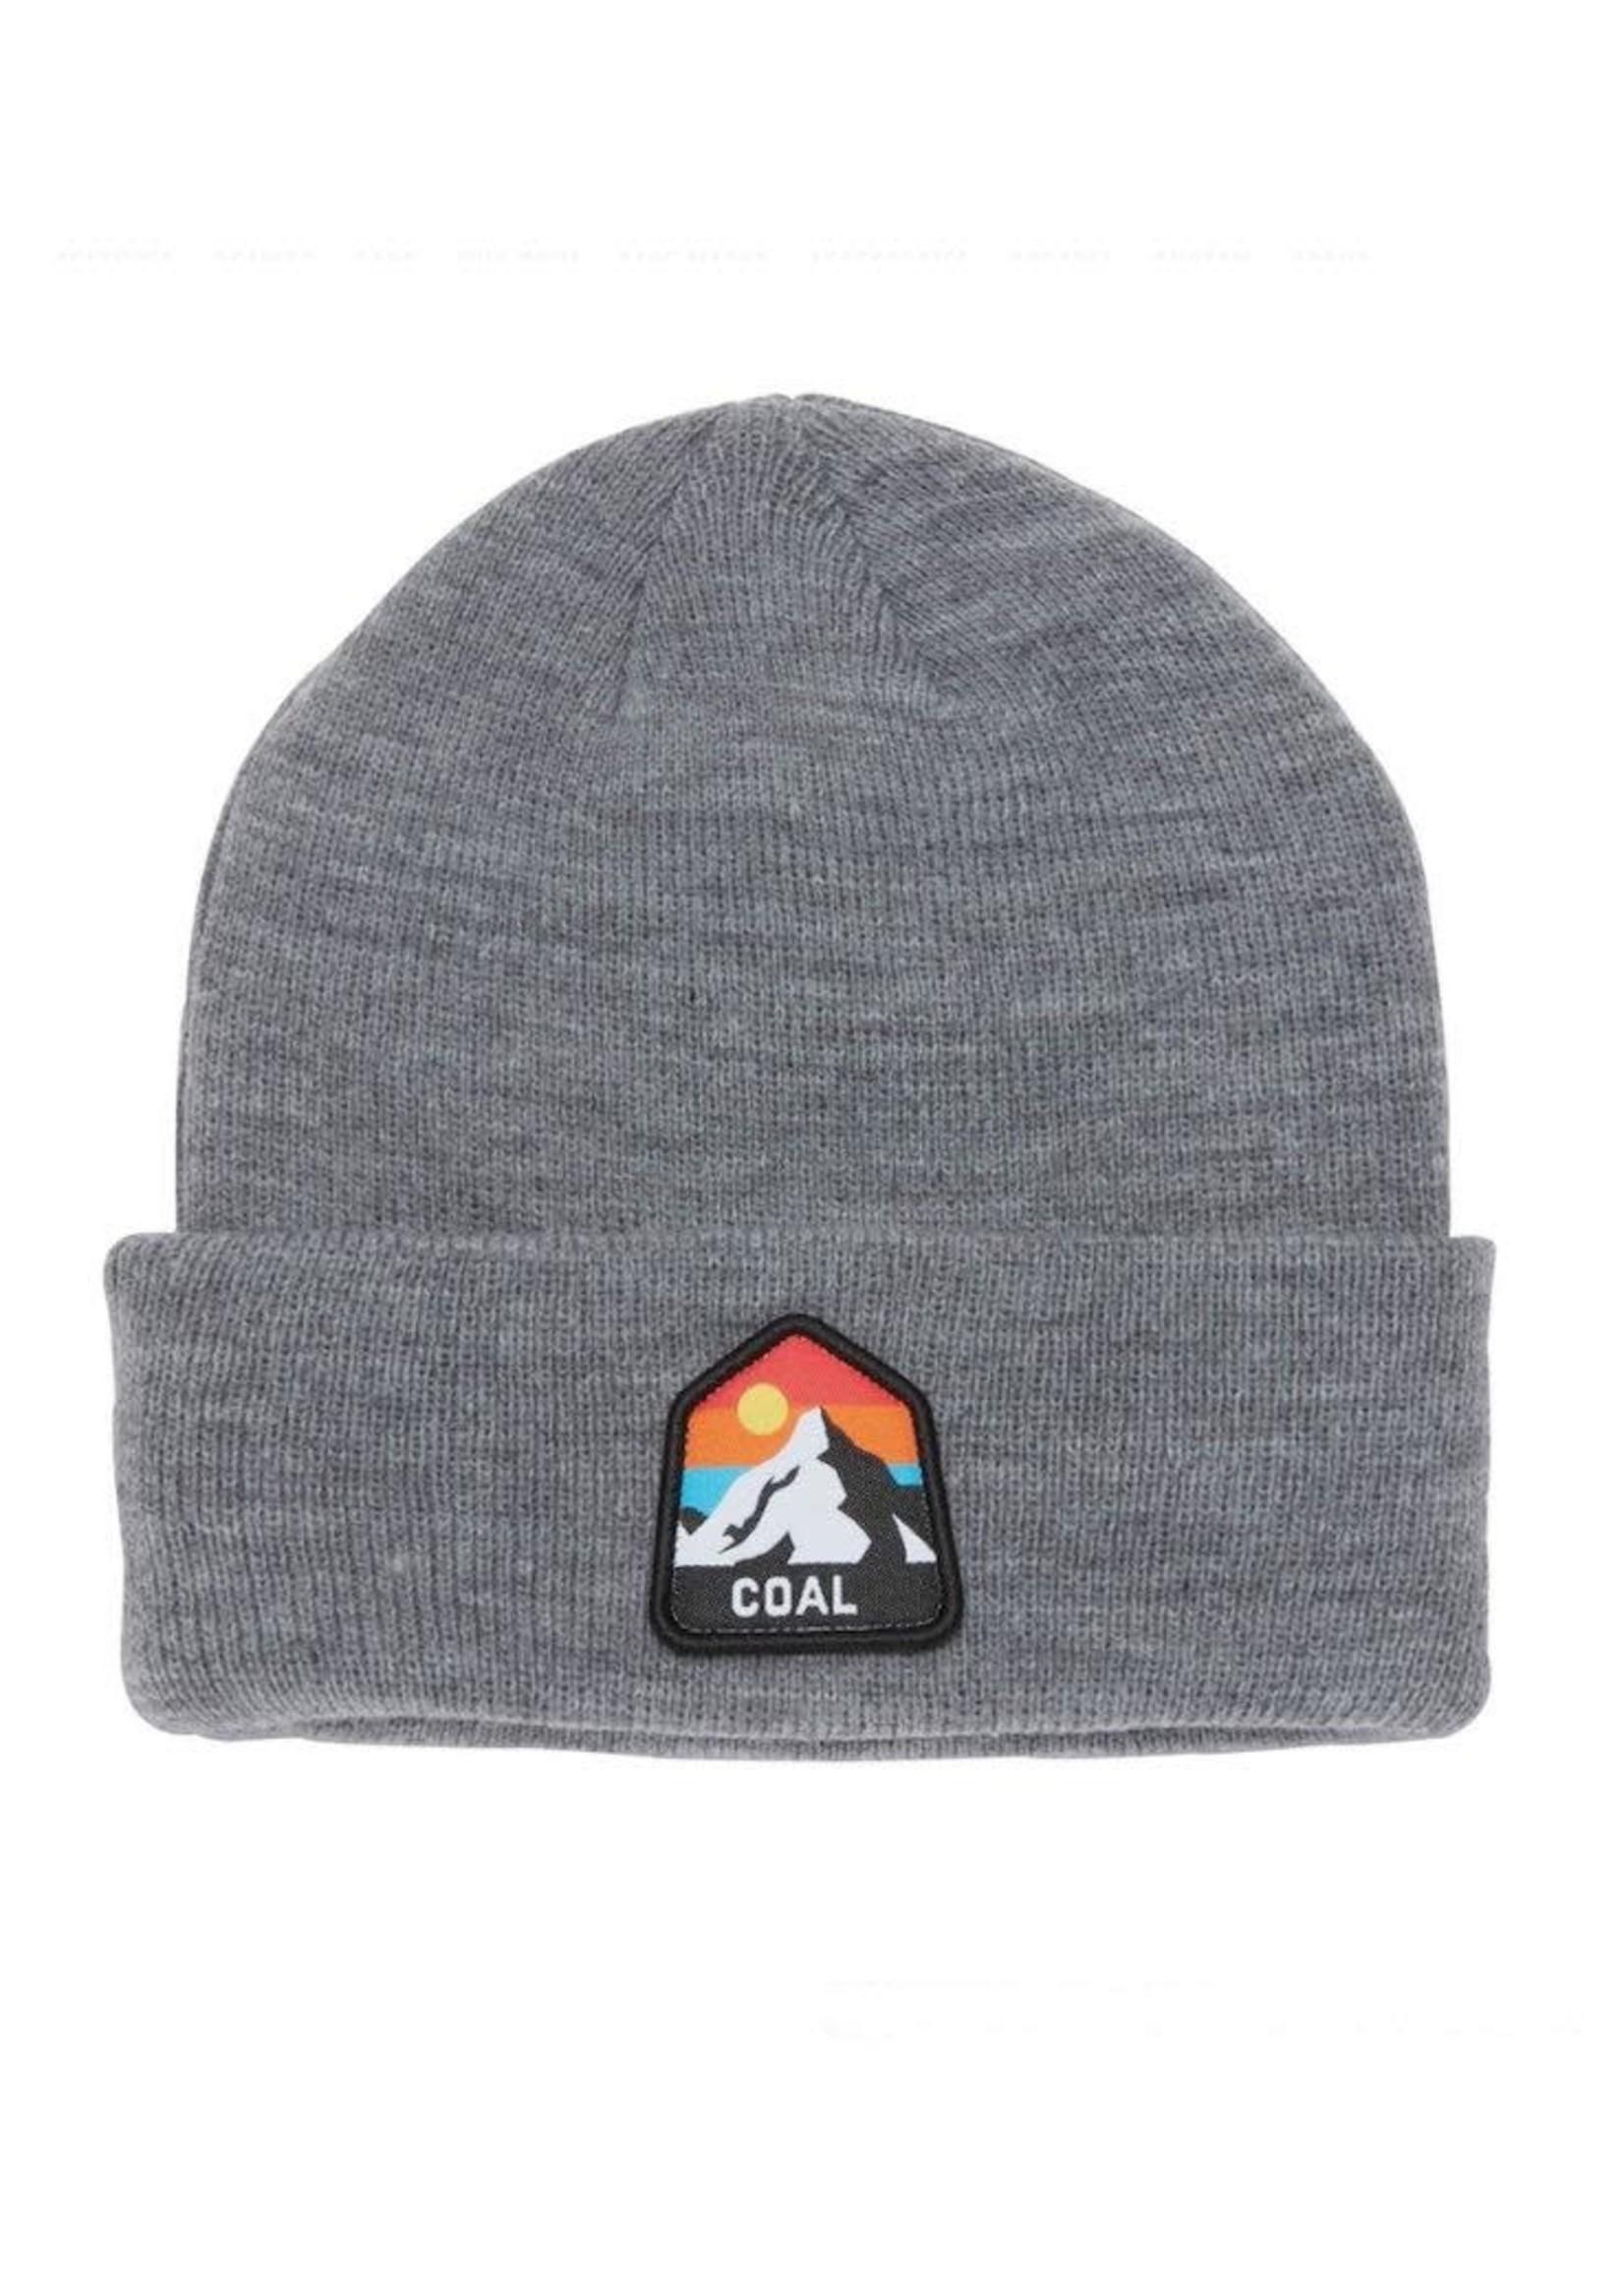 Coal Coal Headwear, The Peak Kids Cuffed Mountain Beanie in Grey